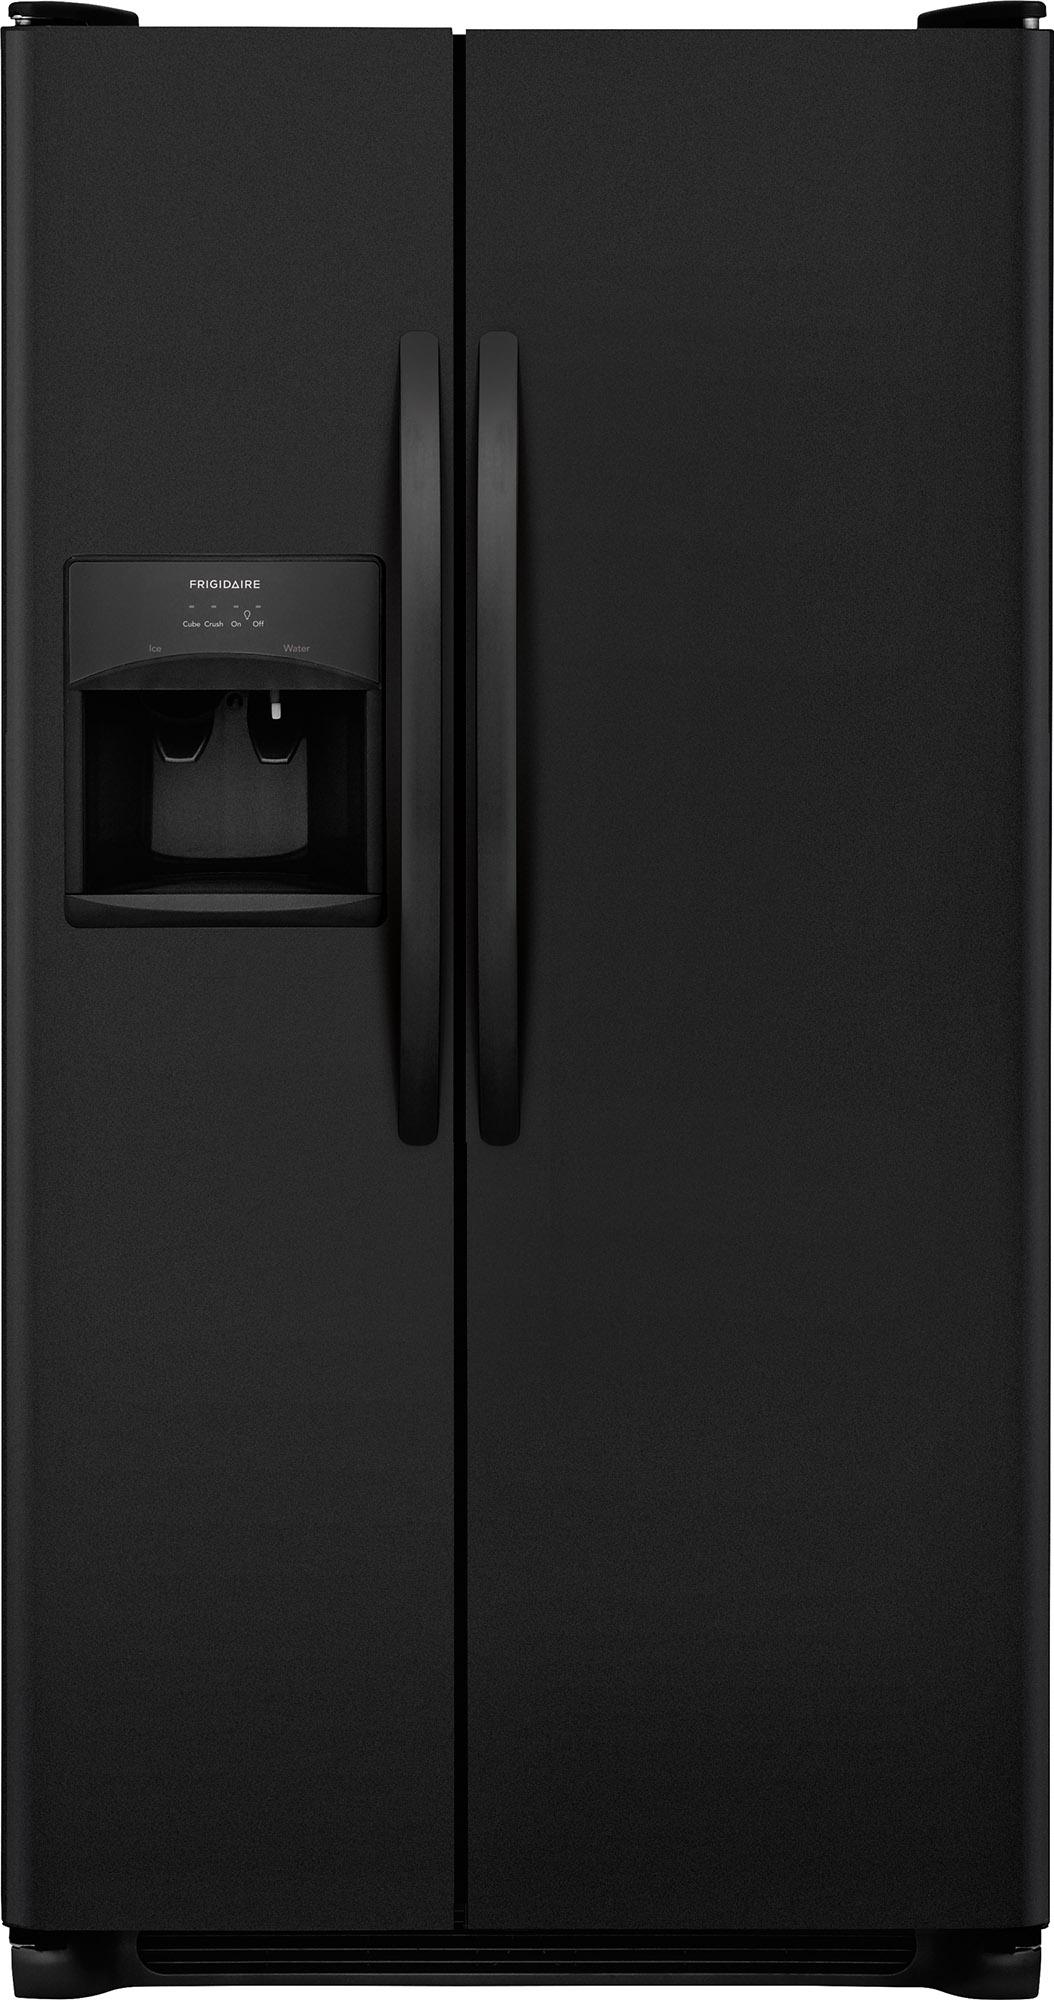 Frigidaire Refrigerator: Model FFSS2615TE0 Parts & Repair